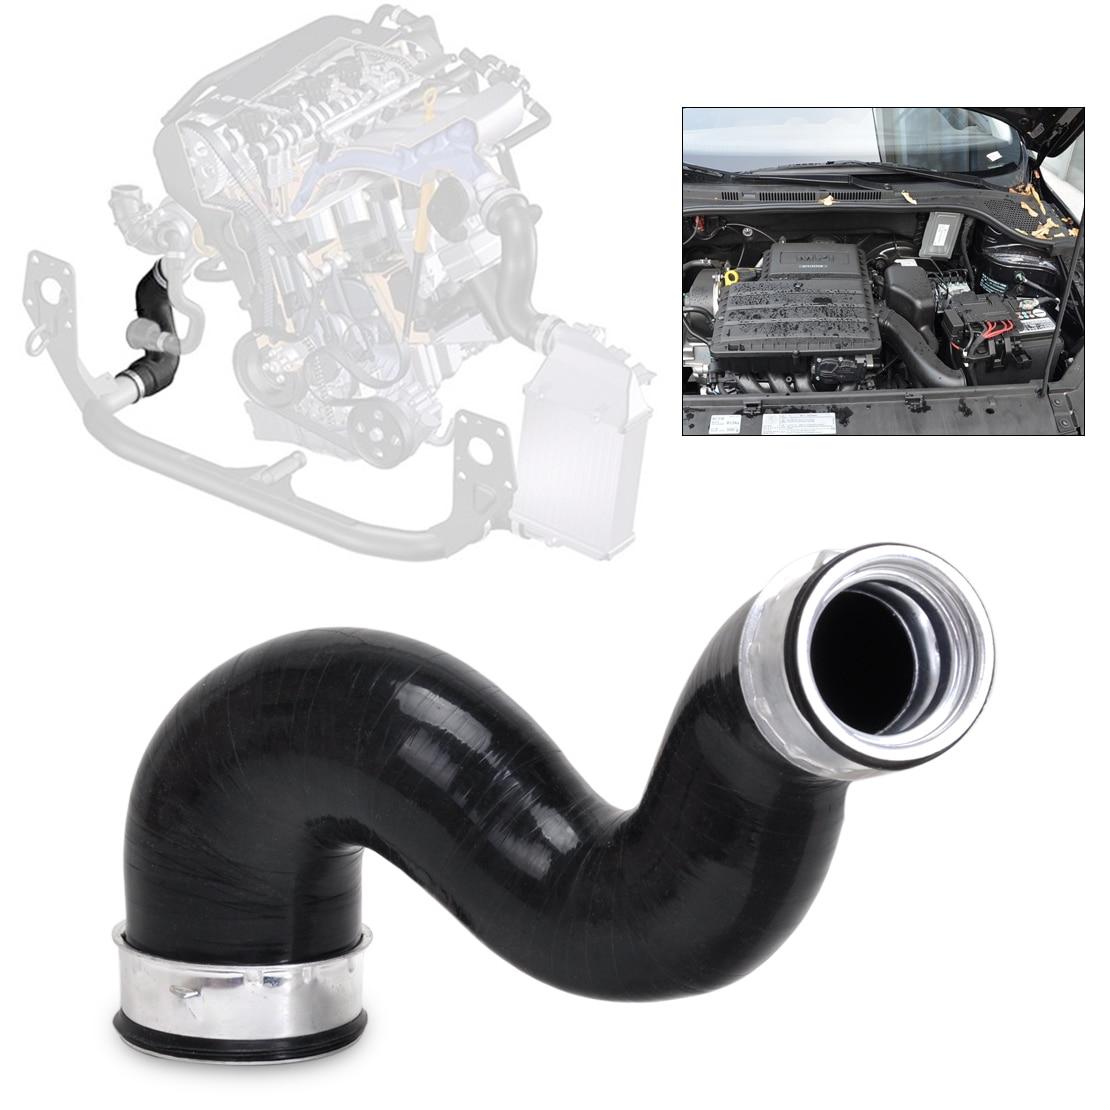 DWCX 3B0145828G tuyau Intercooler Turbo pour Vw Passat B5 3B3 FL/variante 3B6 2000-2005 pour Skoda Superb 3U4 2001-2008